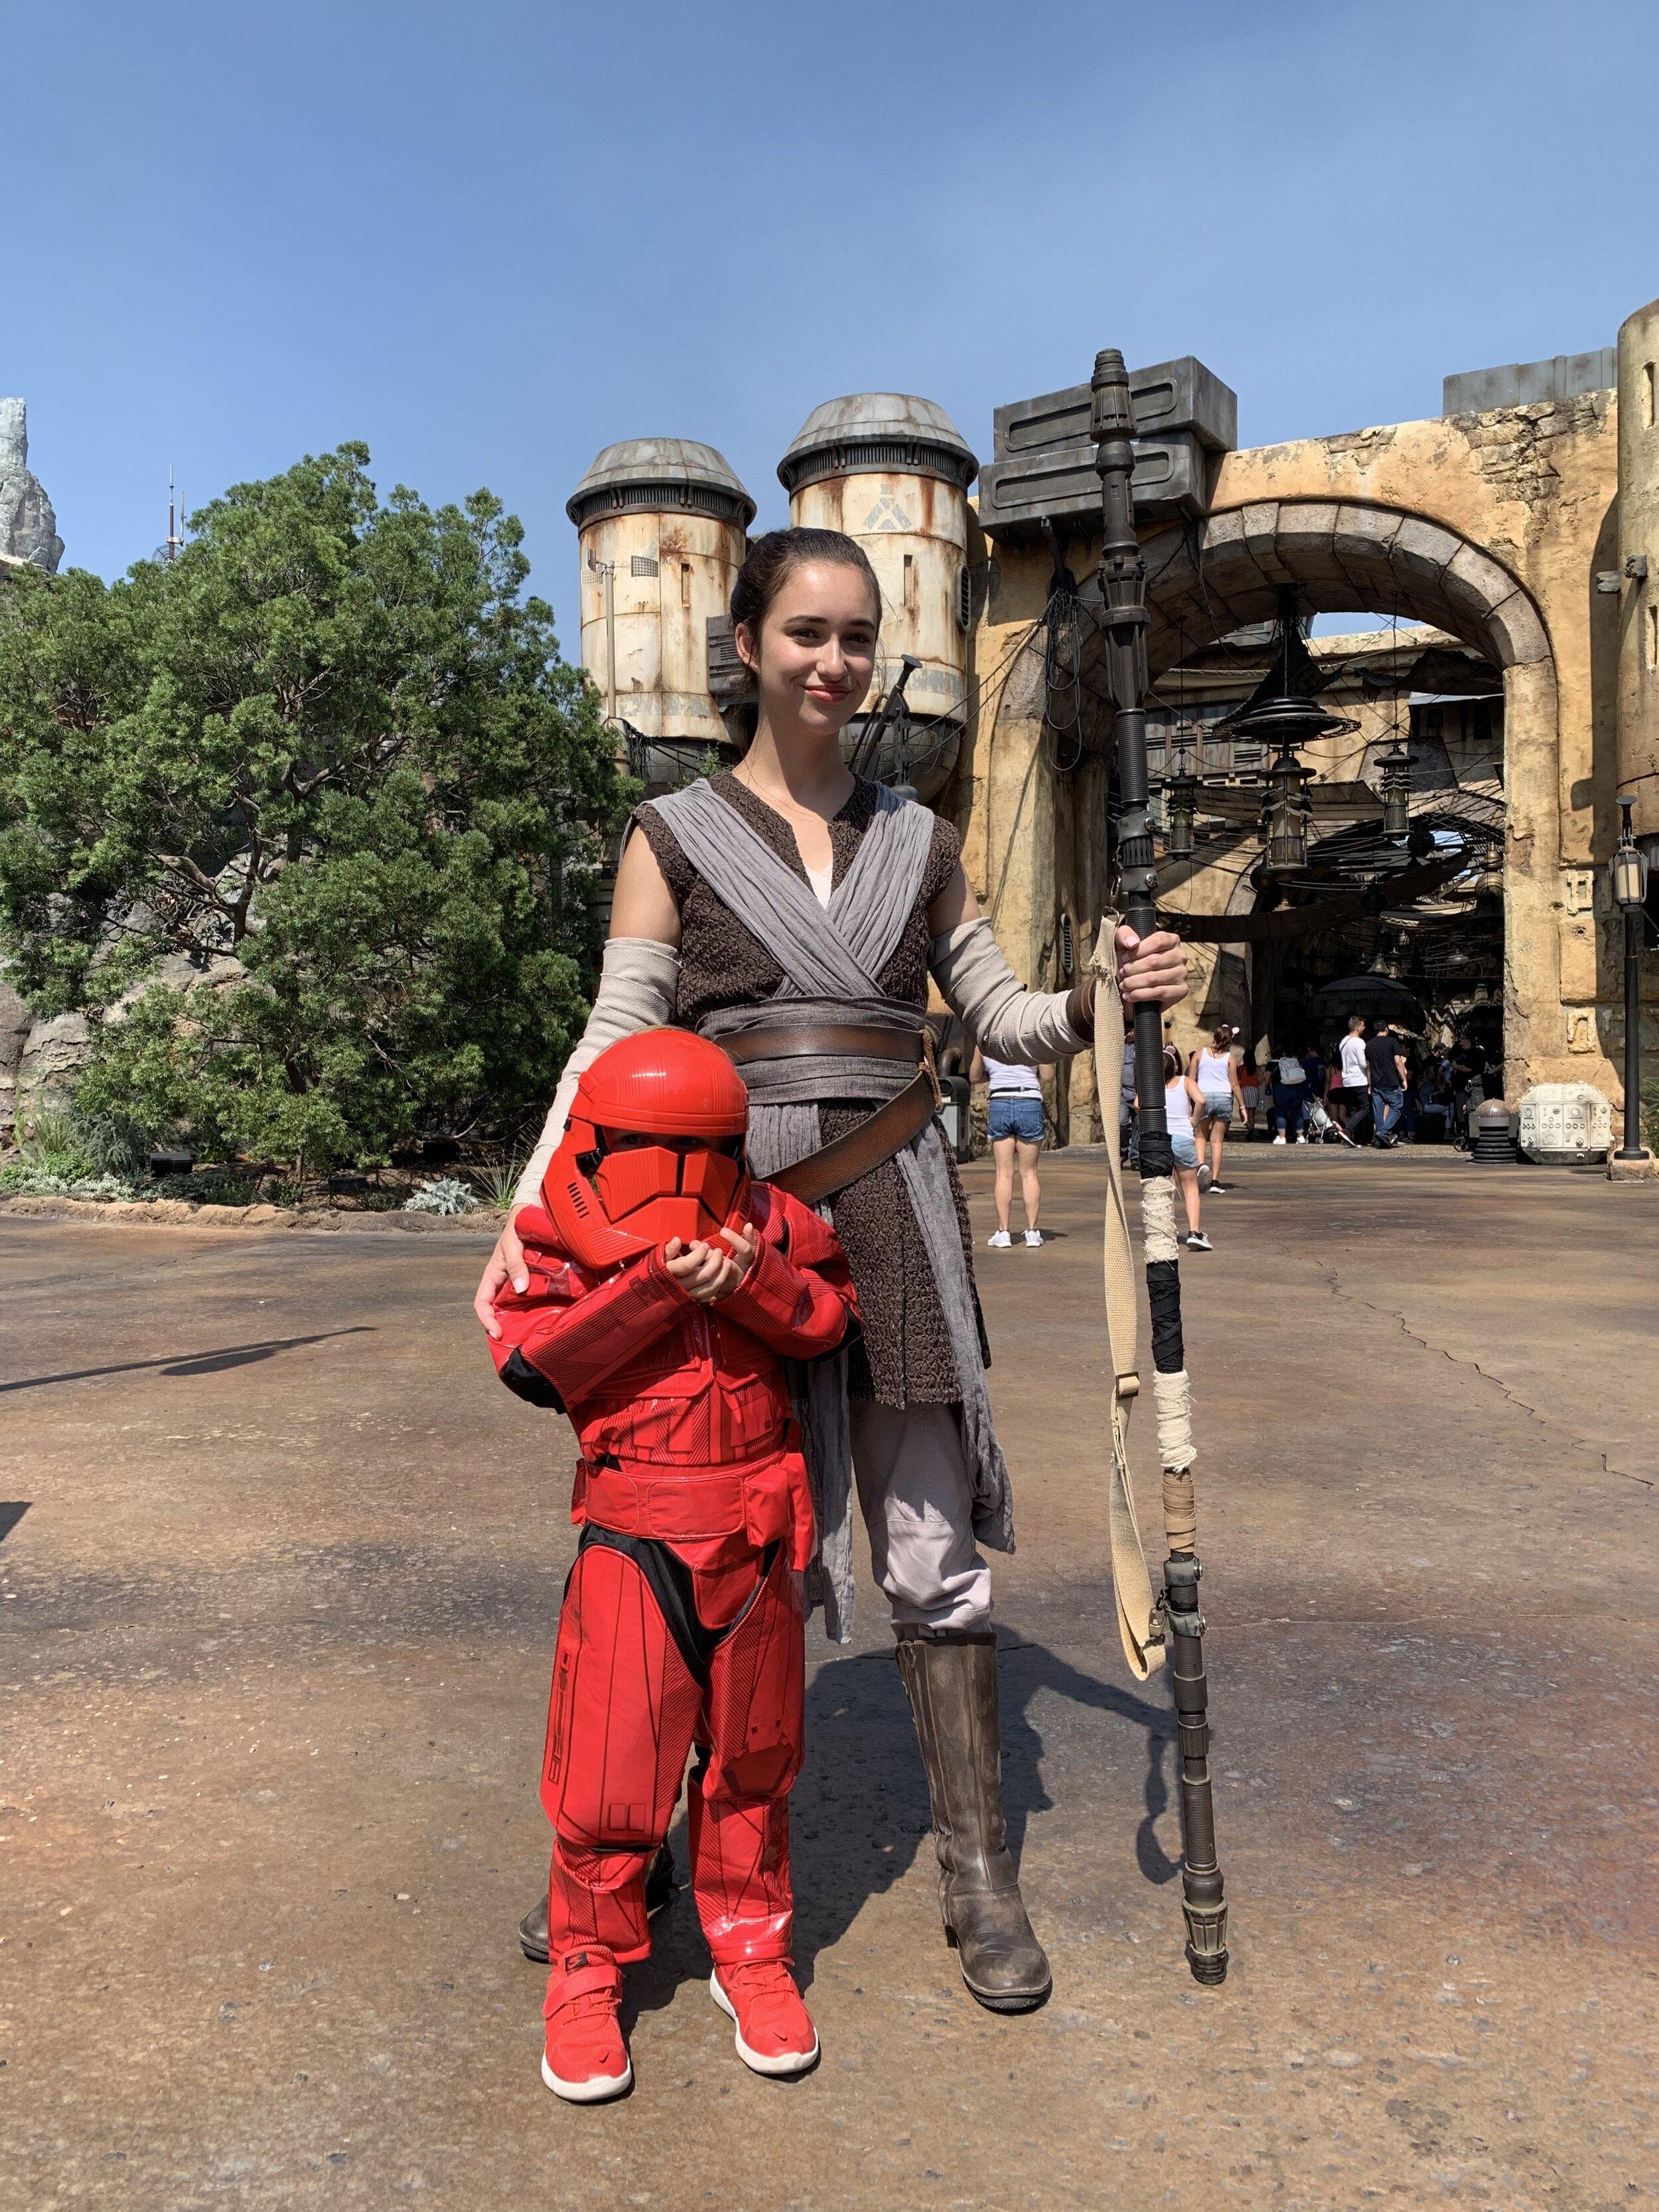 James in costume at Disneyland. 😂